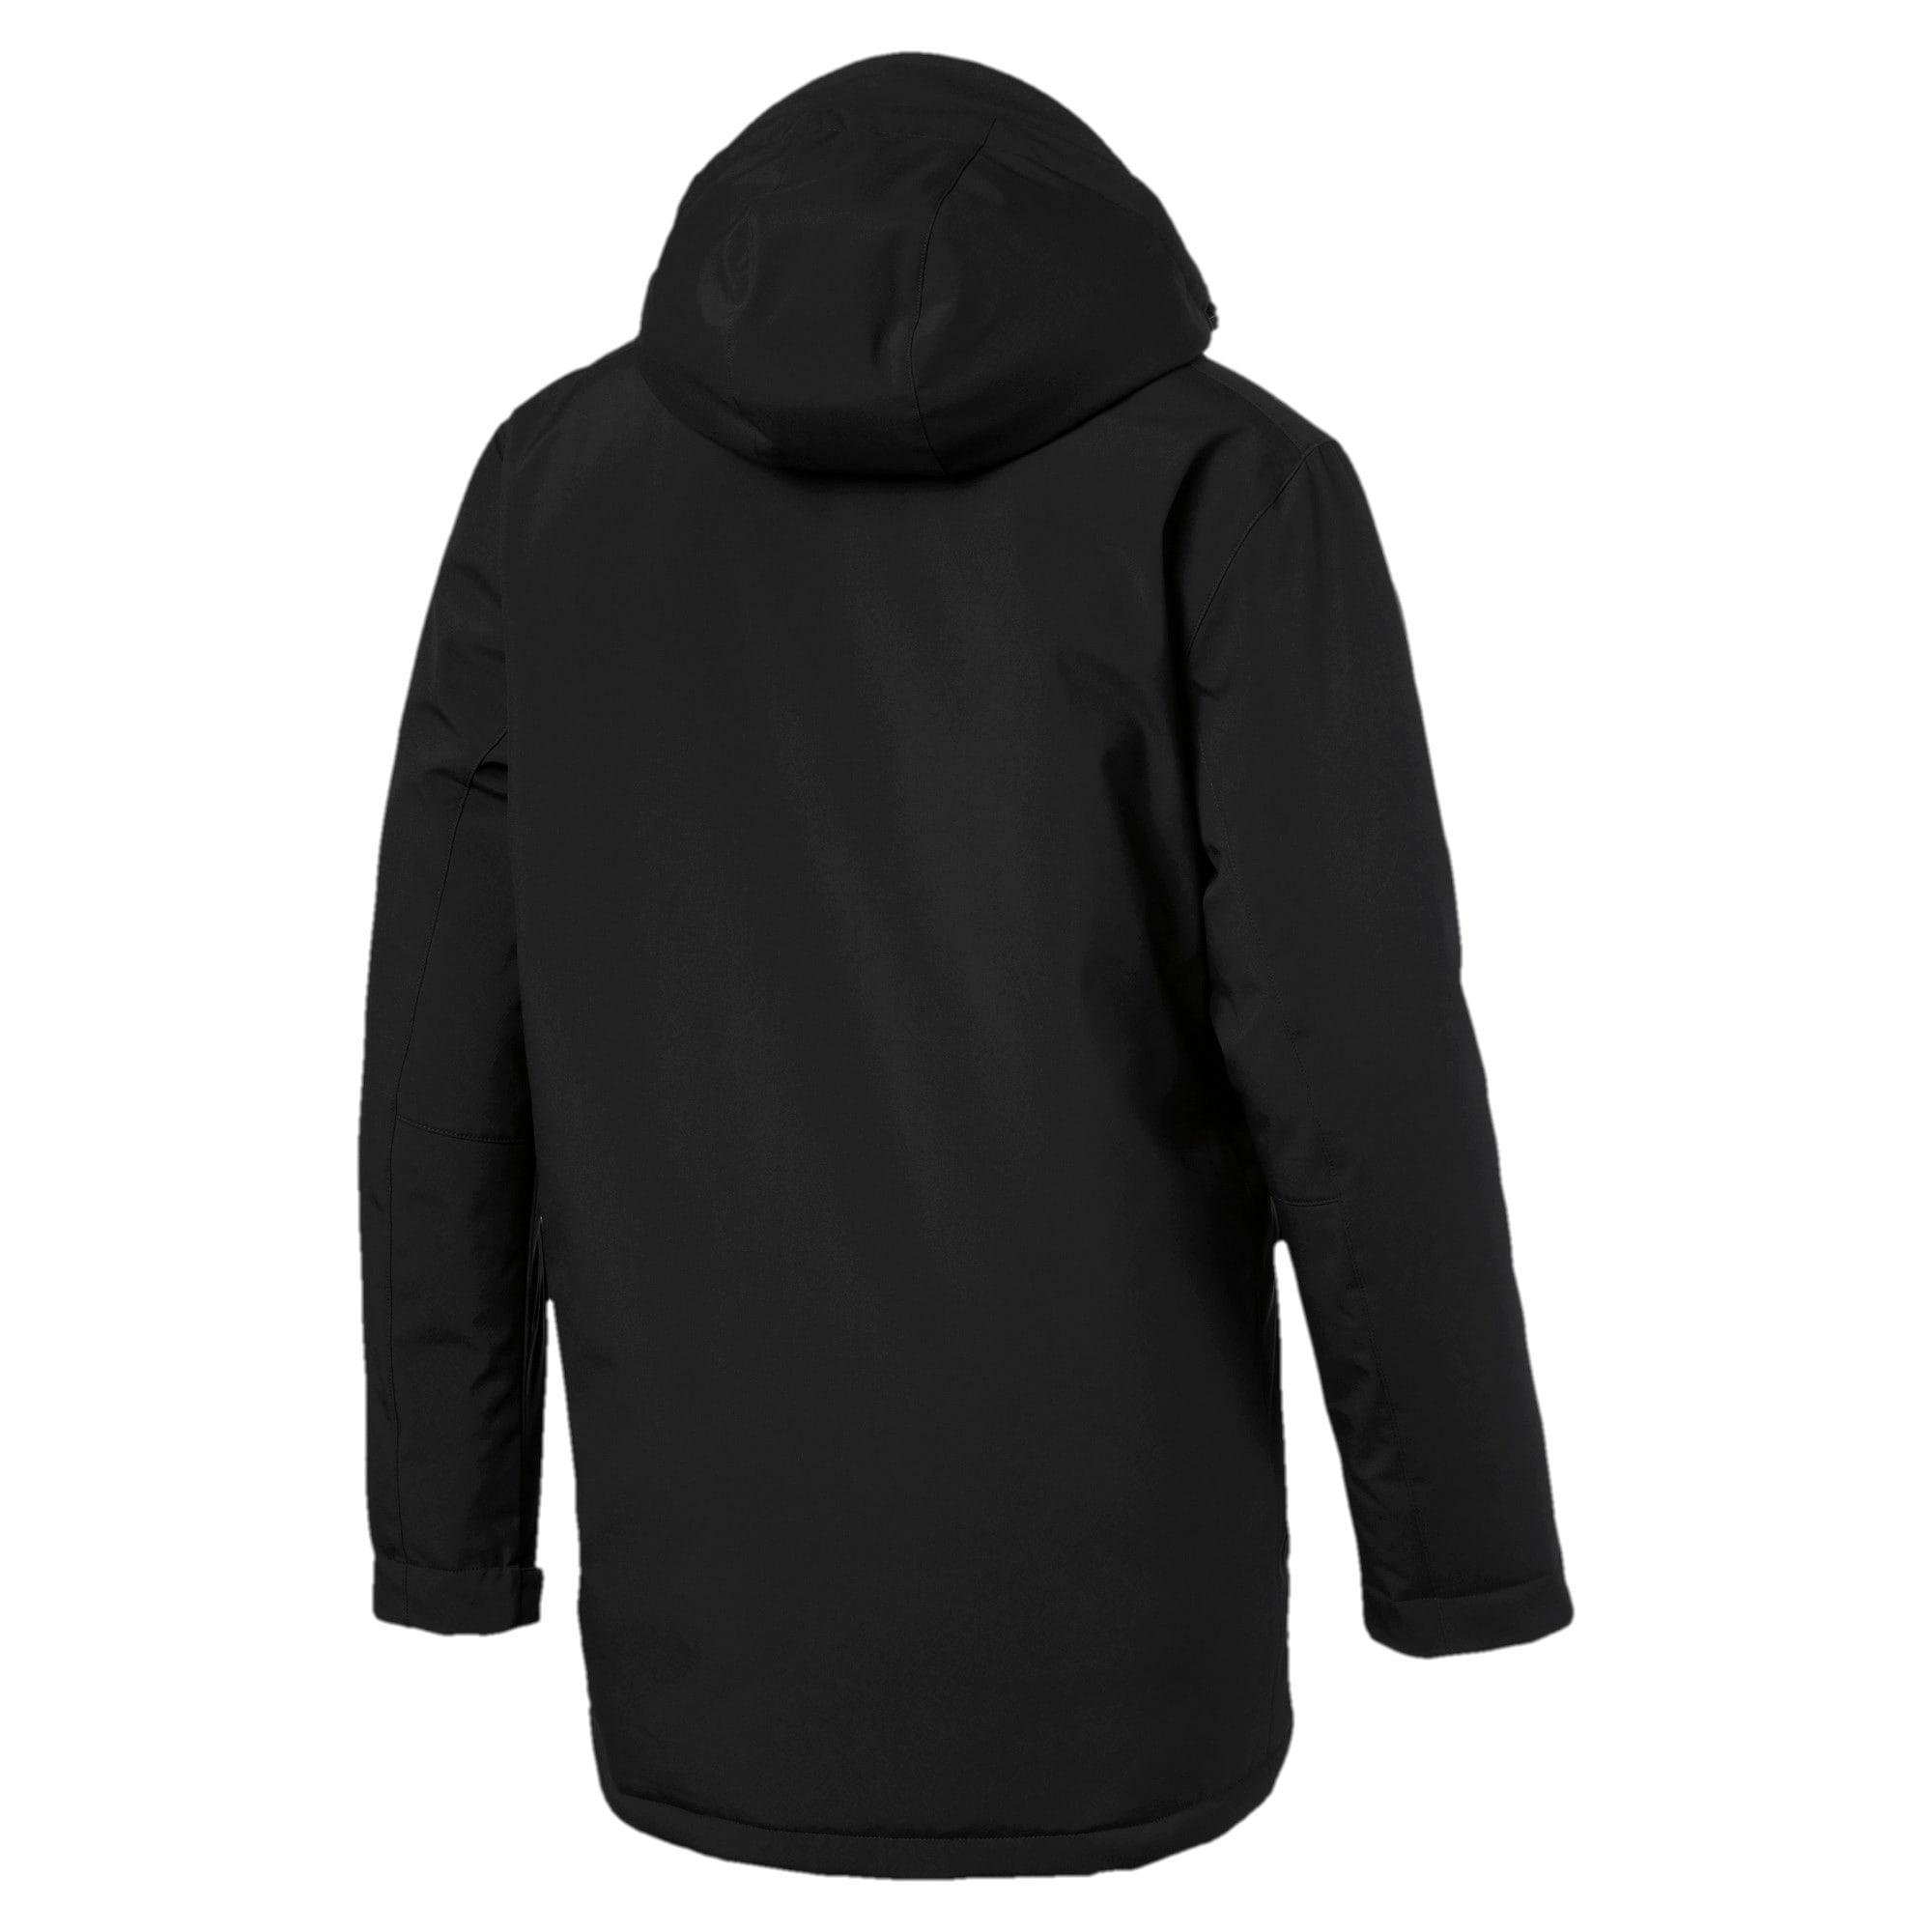 Thumbnail 5 of Epoch Storm Men's Down Jacket, Puma Black, medium